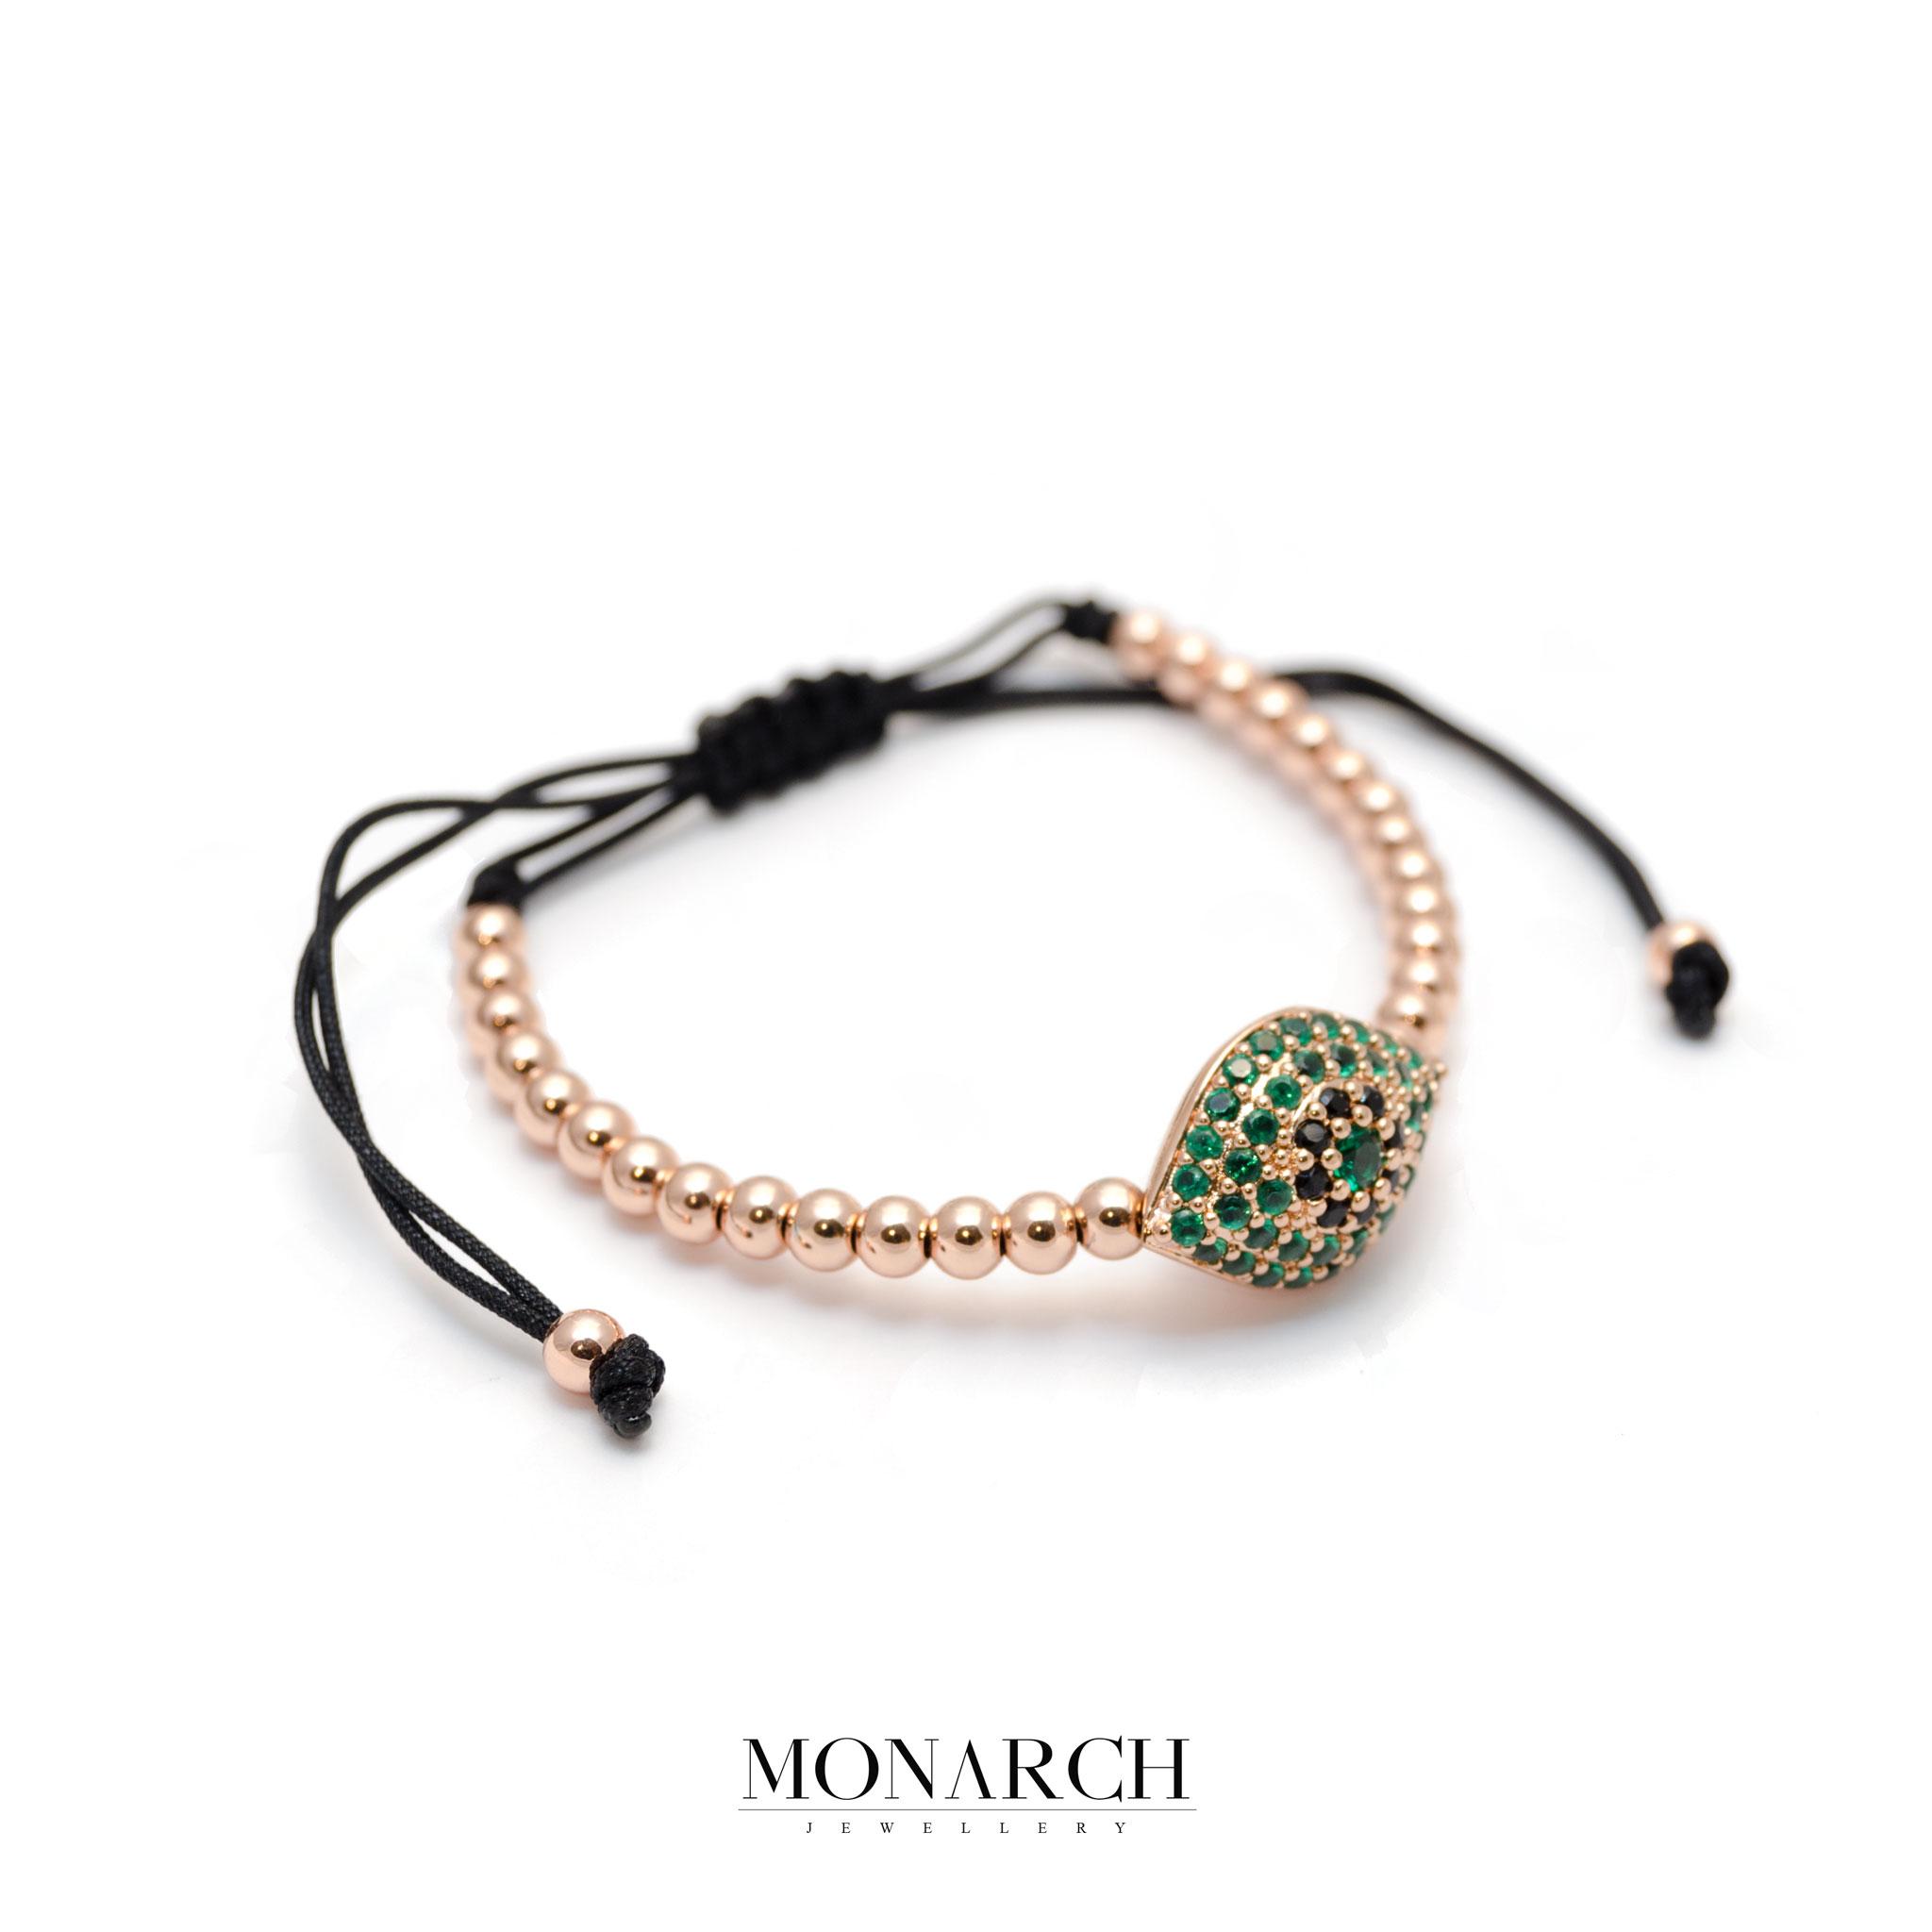 Monarch Jewellery Gold Rose Emerald Evil Eye Charm Macrame Bracelet